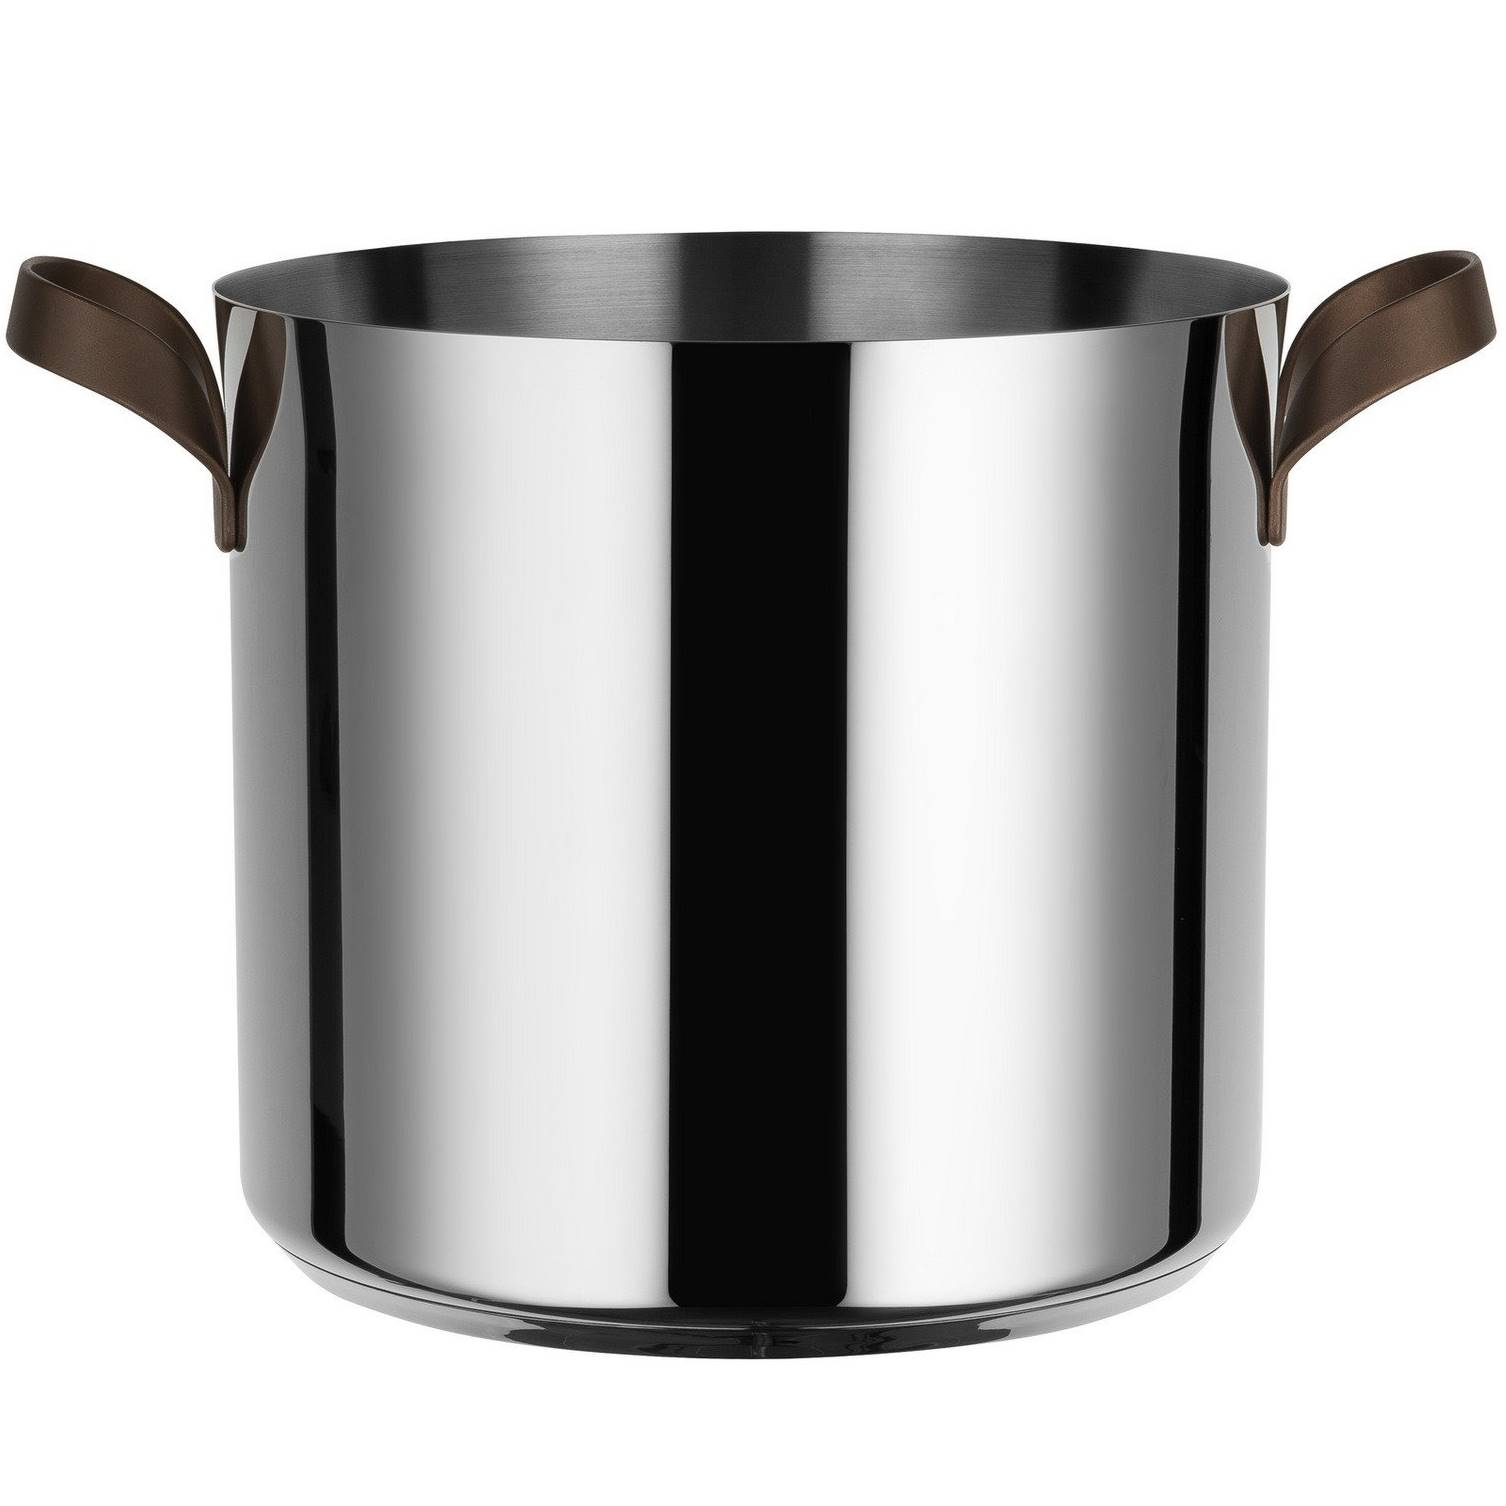 Alessi designové hrnce na polévku Edo (objem 850 cl)